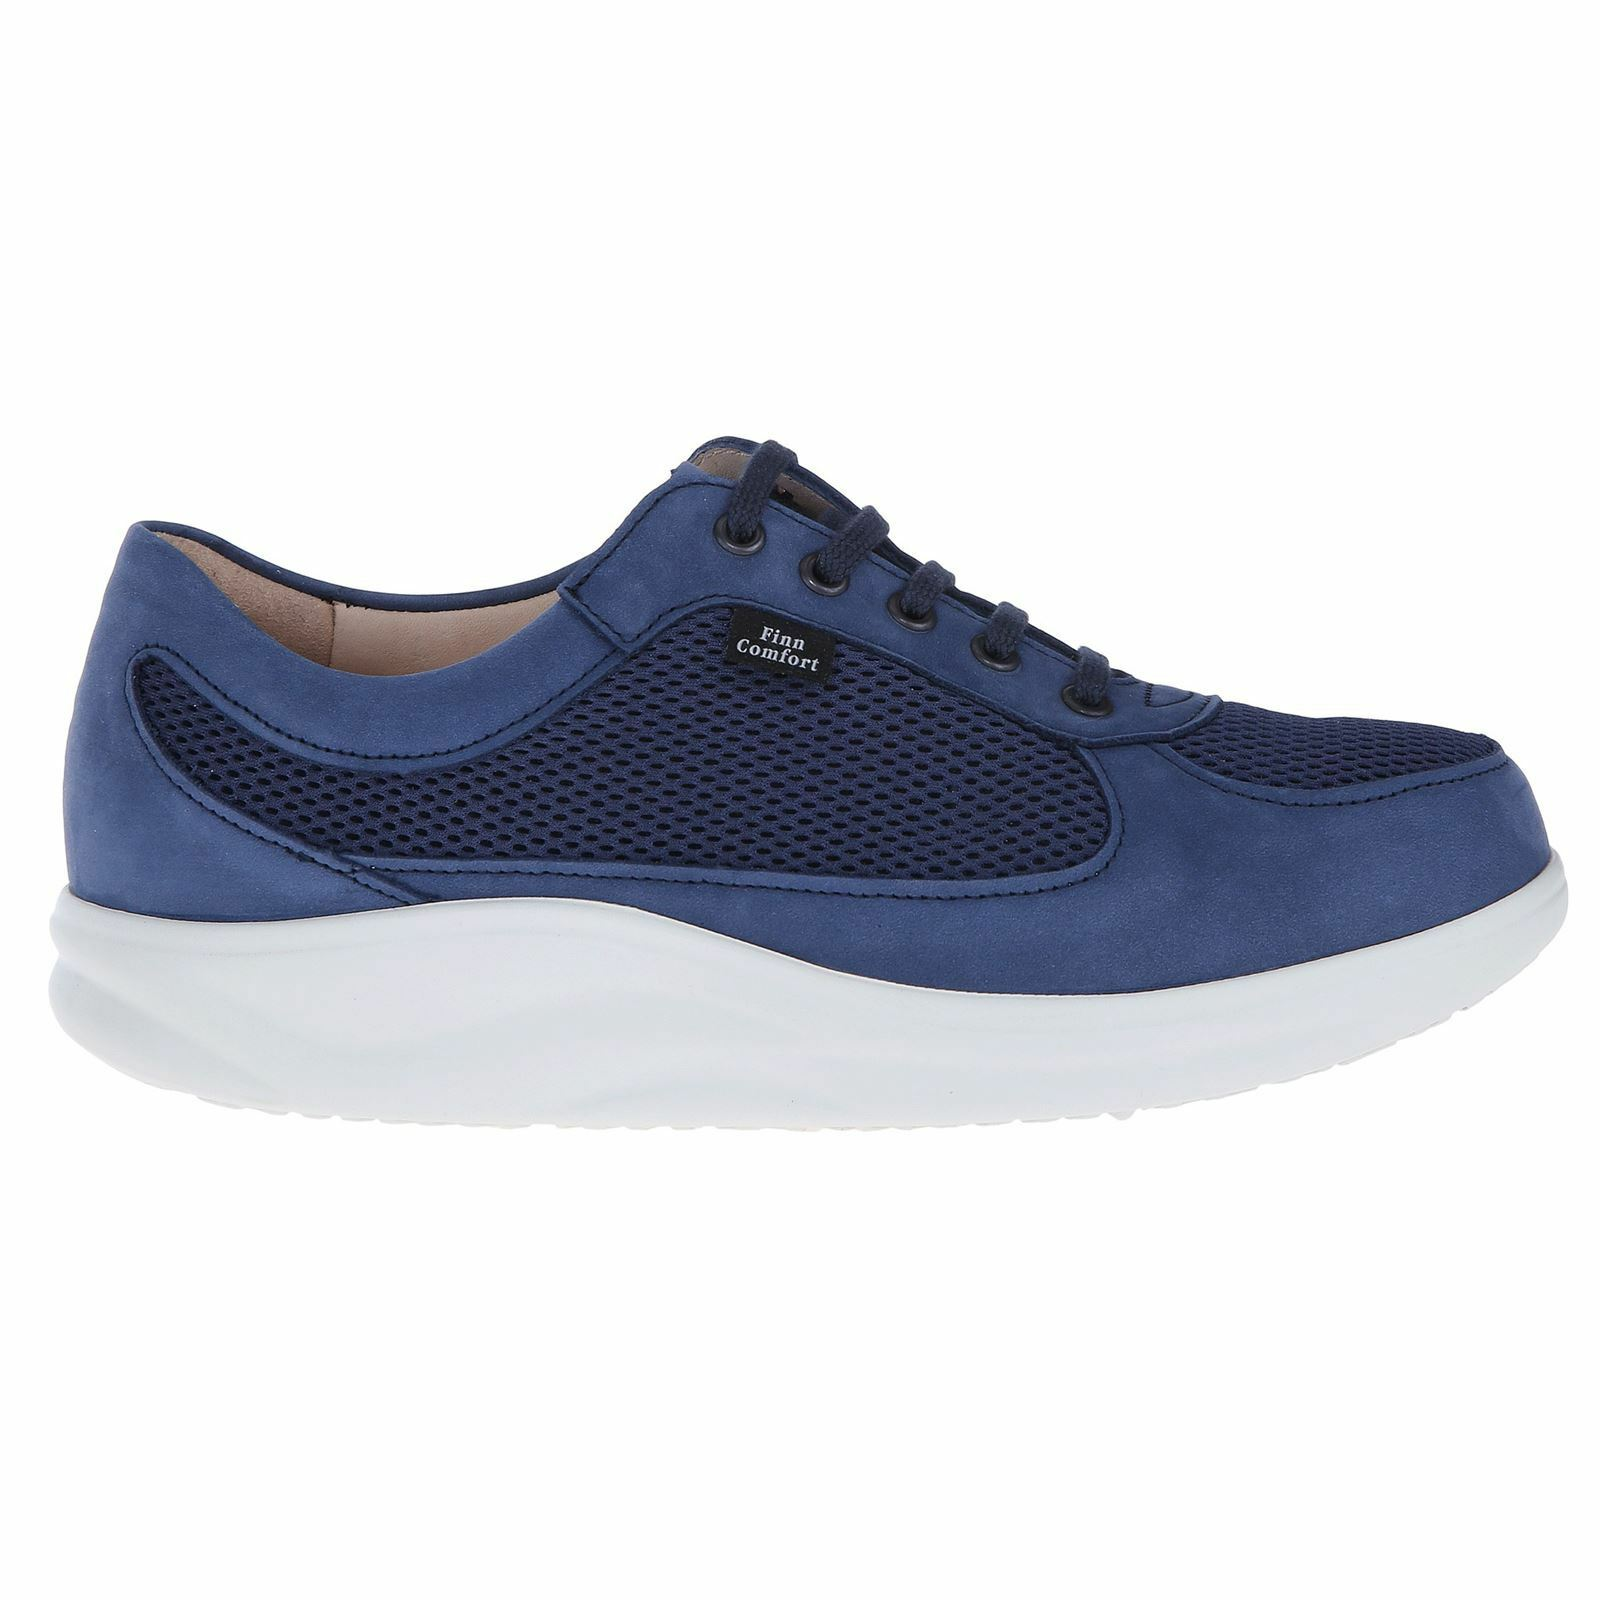 Finn Comfort 2922 Columbia Denim Womens Shoes